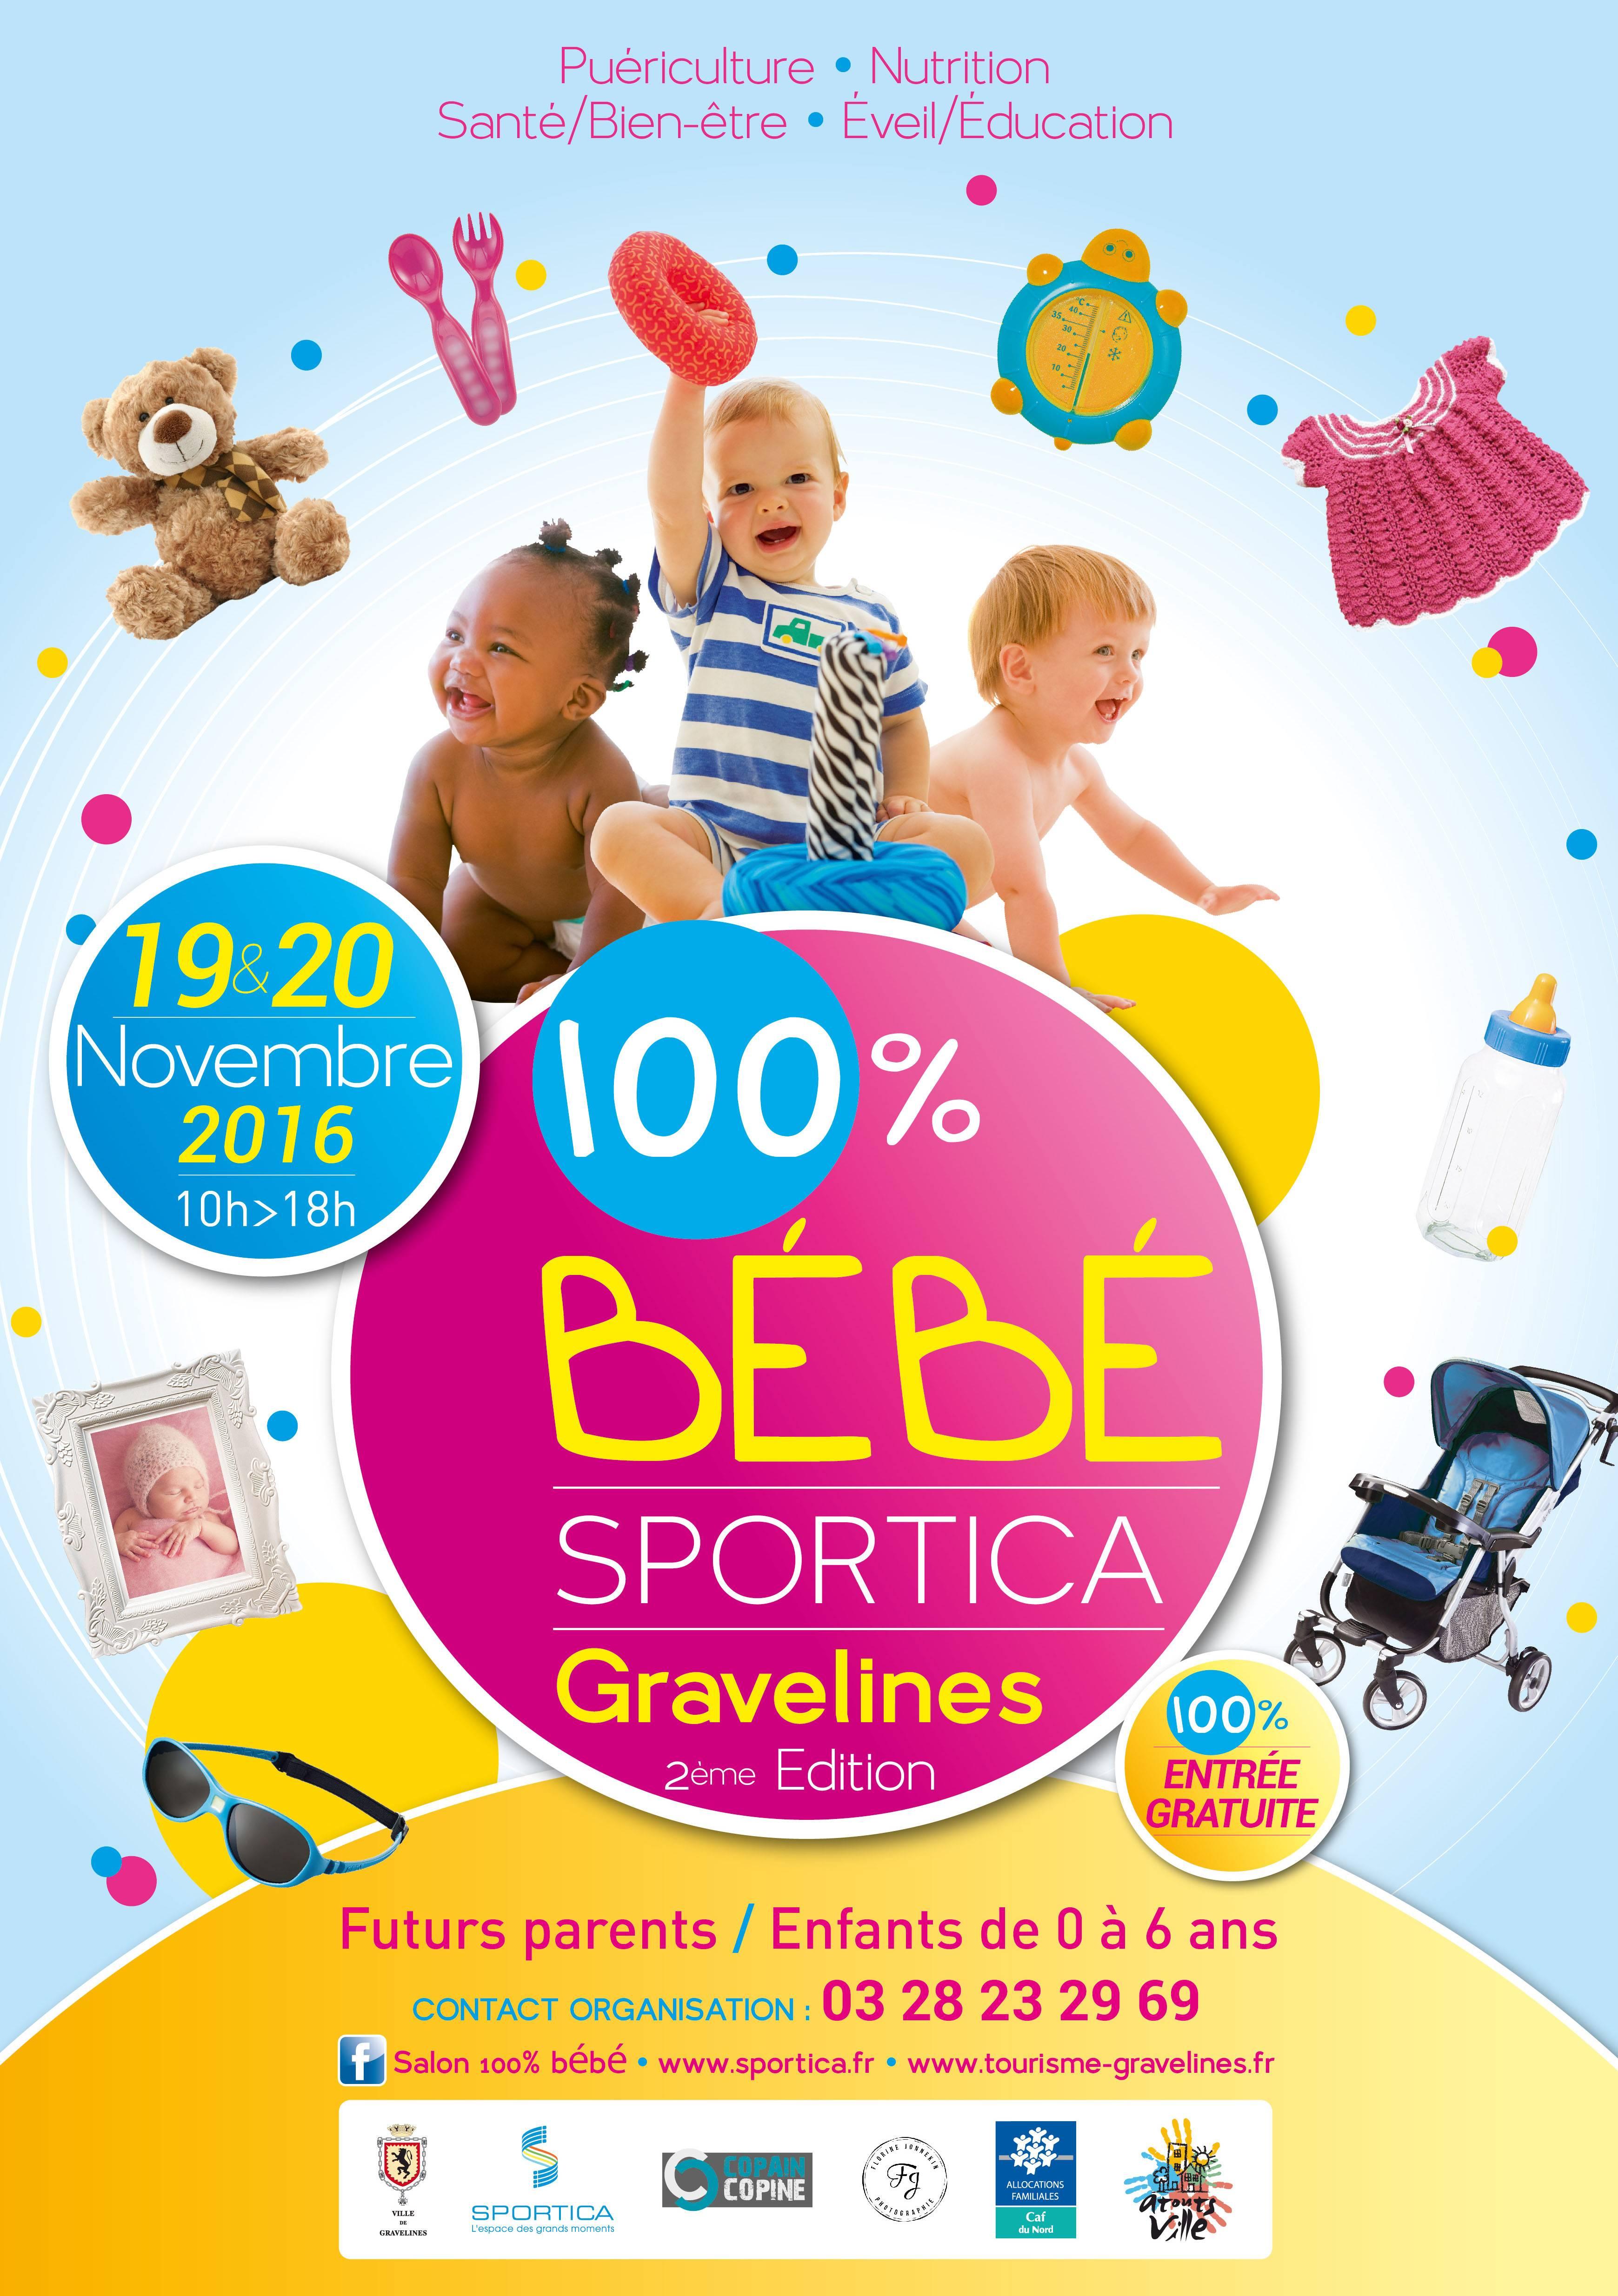 Salon du b b sportica gravelines for Piscine sportica